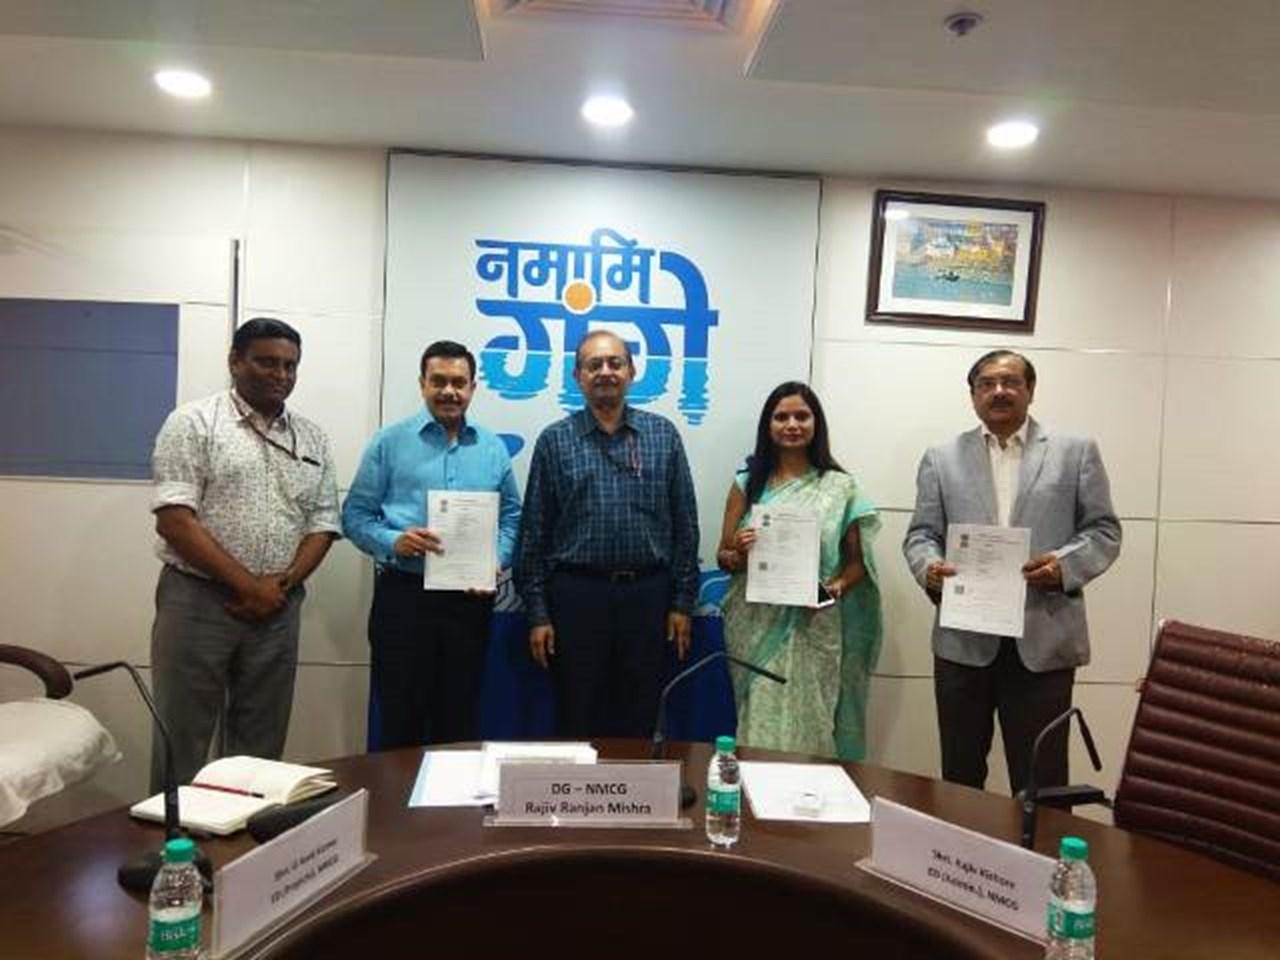 NMGC approves new projects for rejuvenation of 6 rivers in Uttarakhand | ఉత్తరాఖండ్లోని 6 నదుల పునరుజ్జీవనం కోసం కొత్త ప్రాజెక్టులను ఎన్ఎంజిసి ఆమోదించింది |_40.1